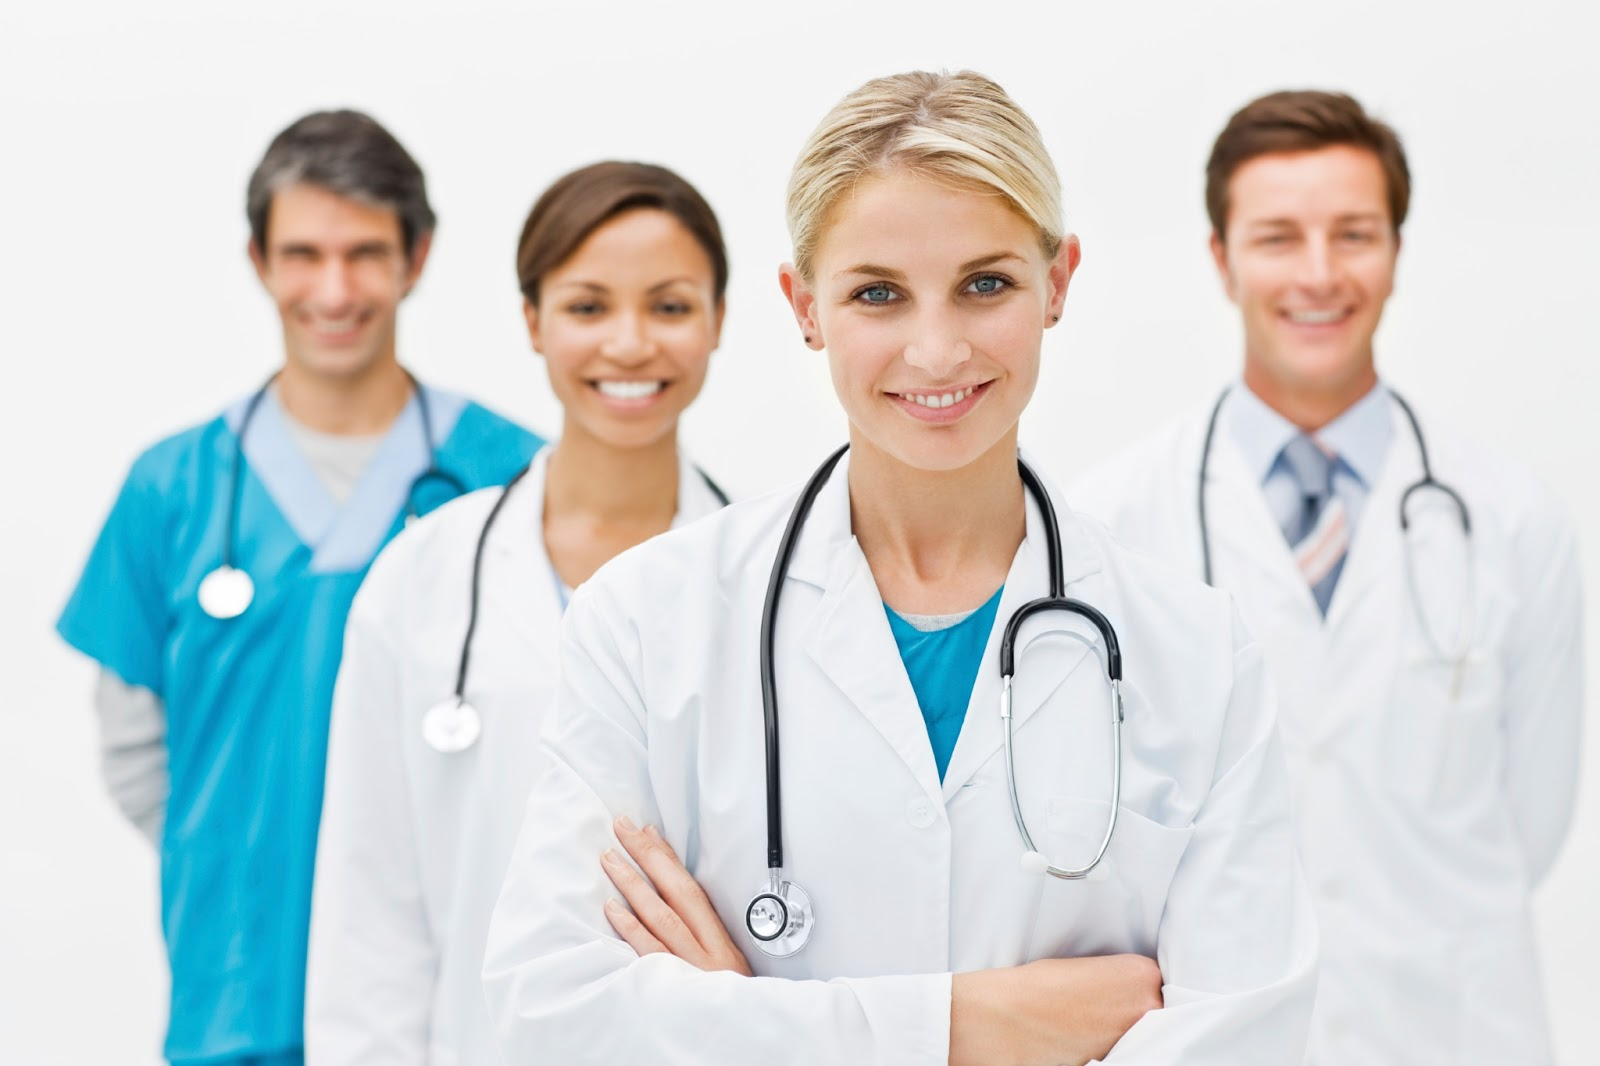 Resultado de imagem para curso de medicina